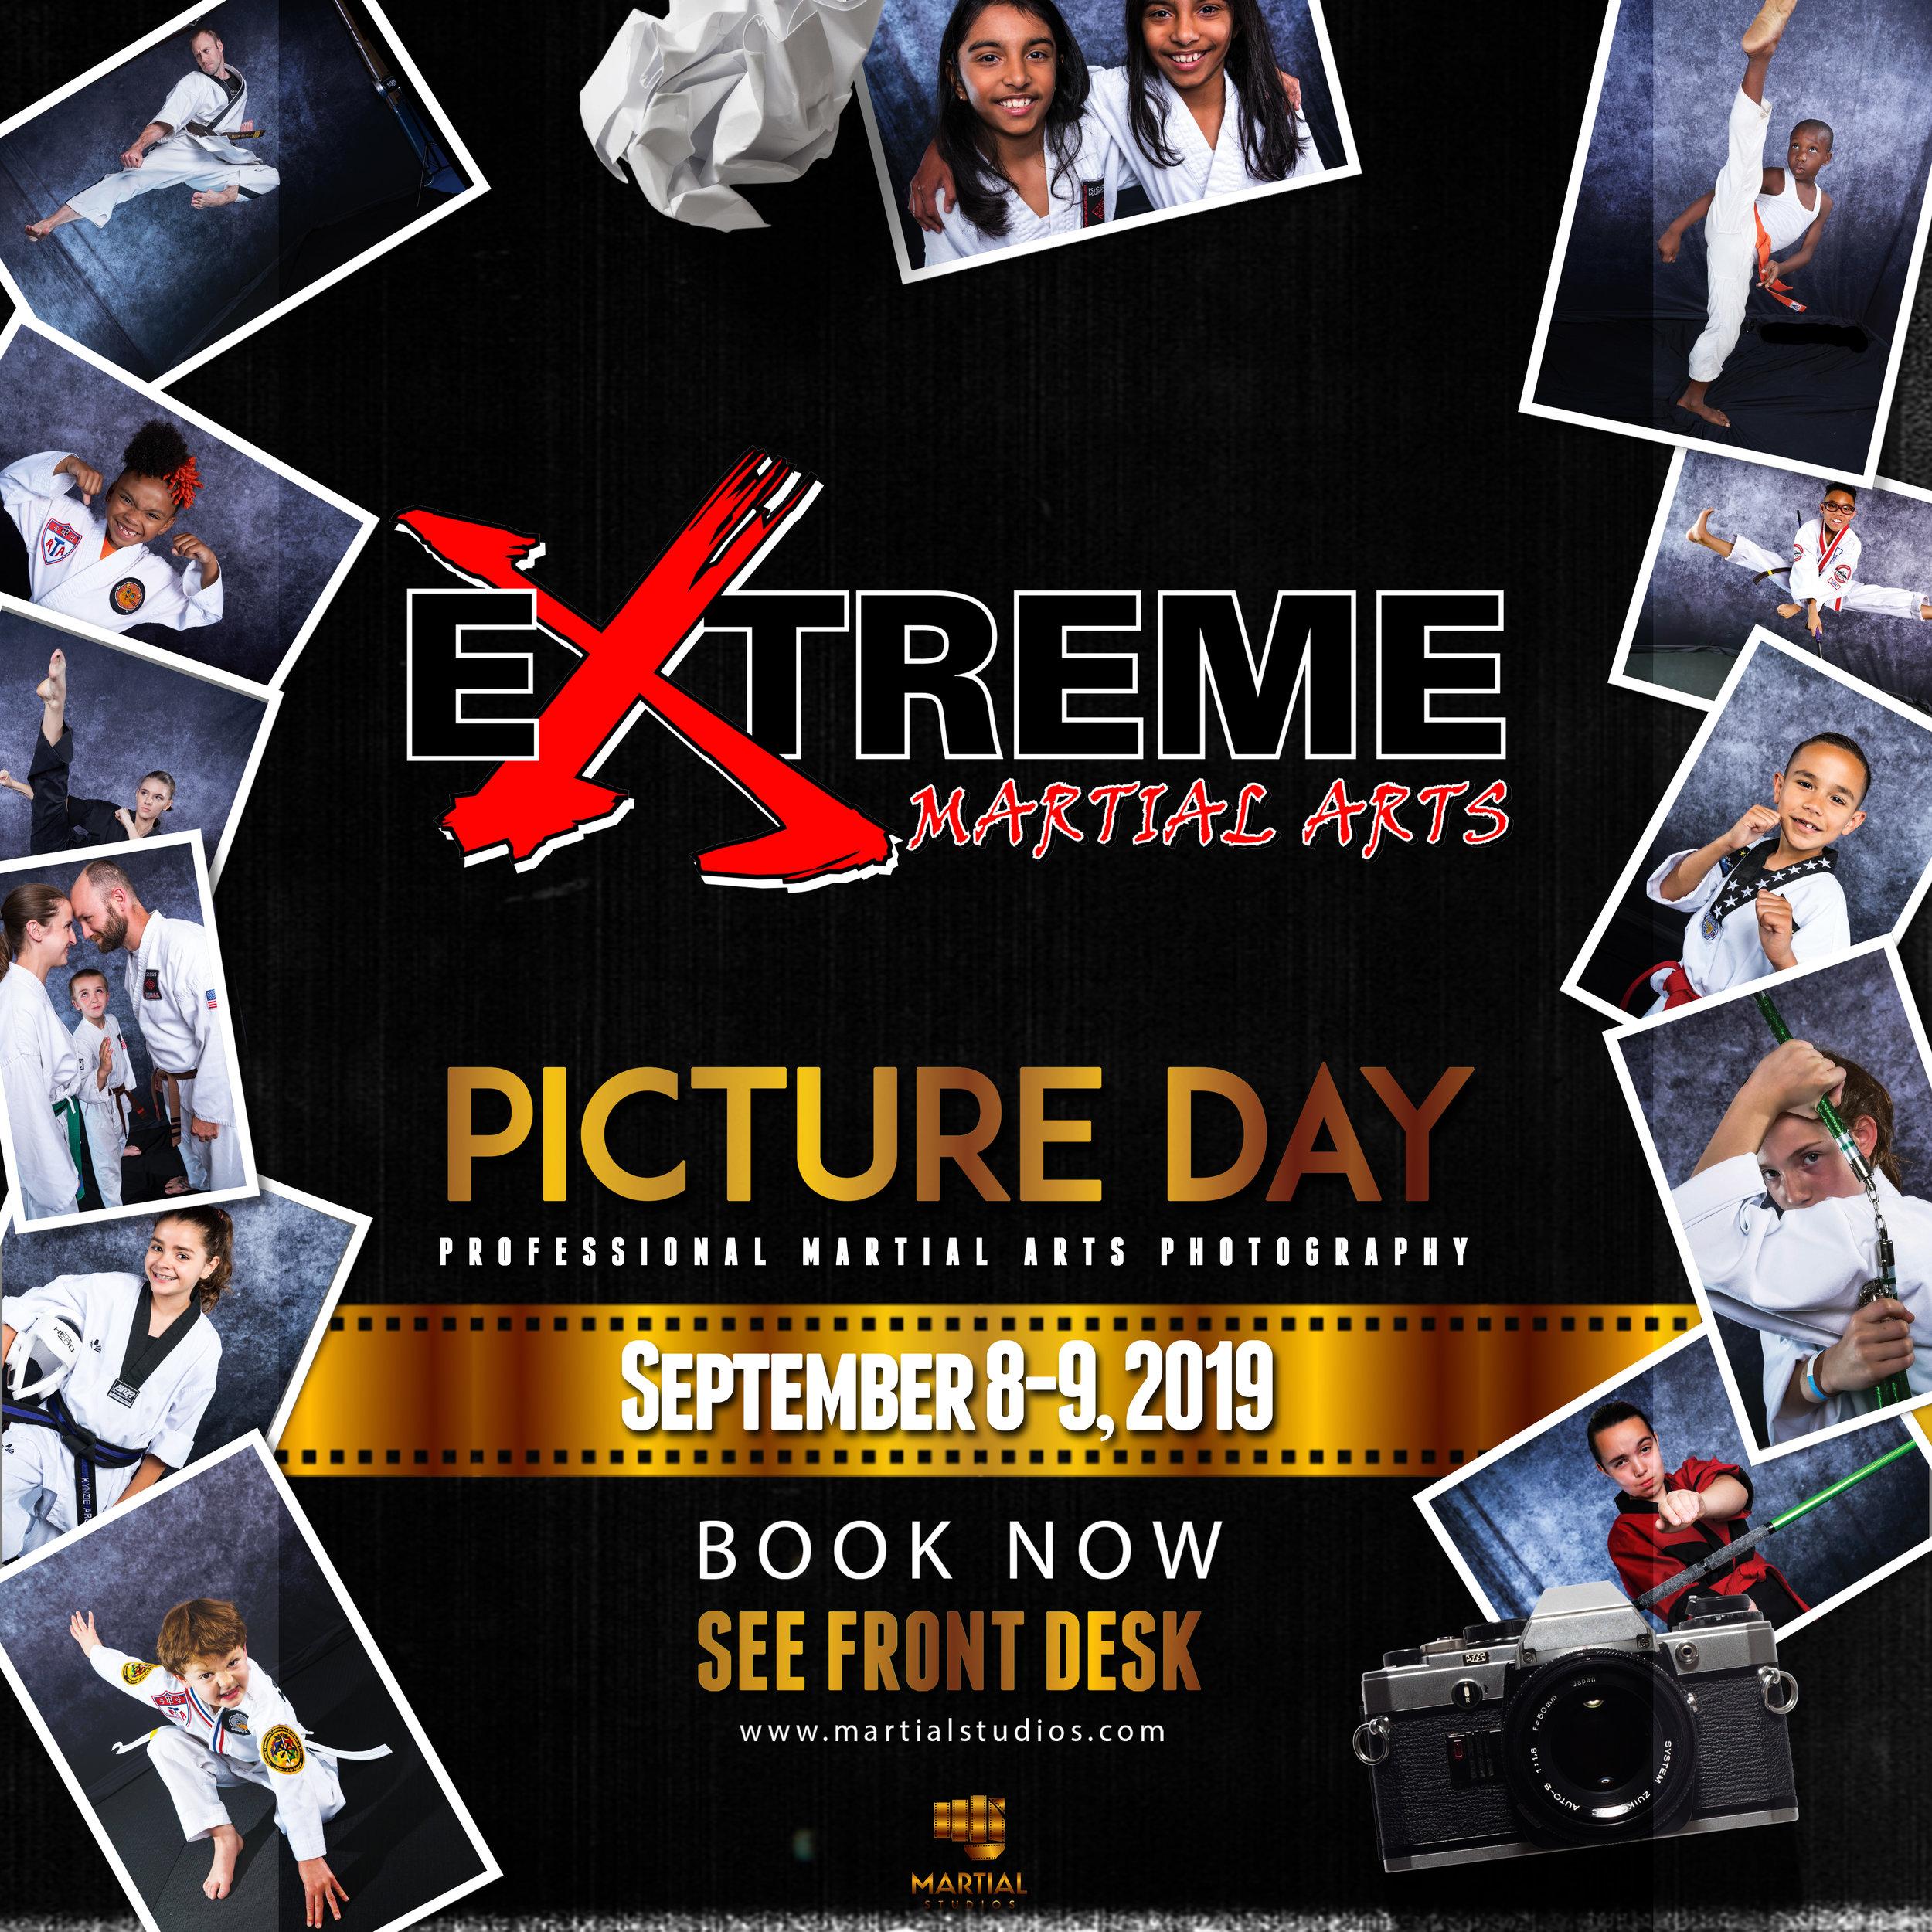 Extreme Martial Arts _Jun 11 2019_social-media.jpg